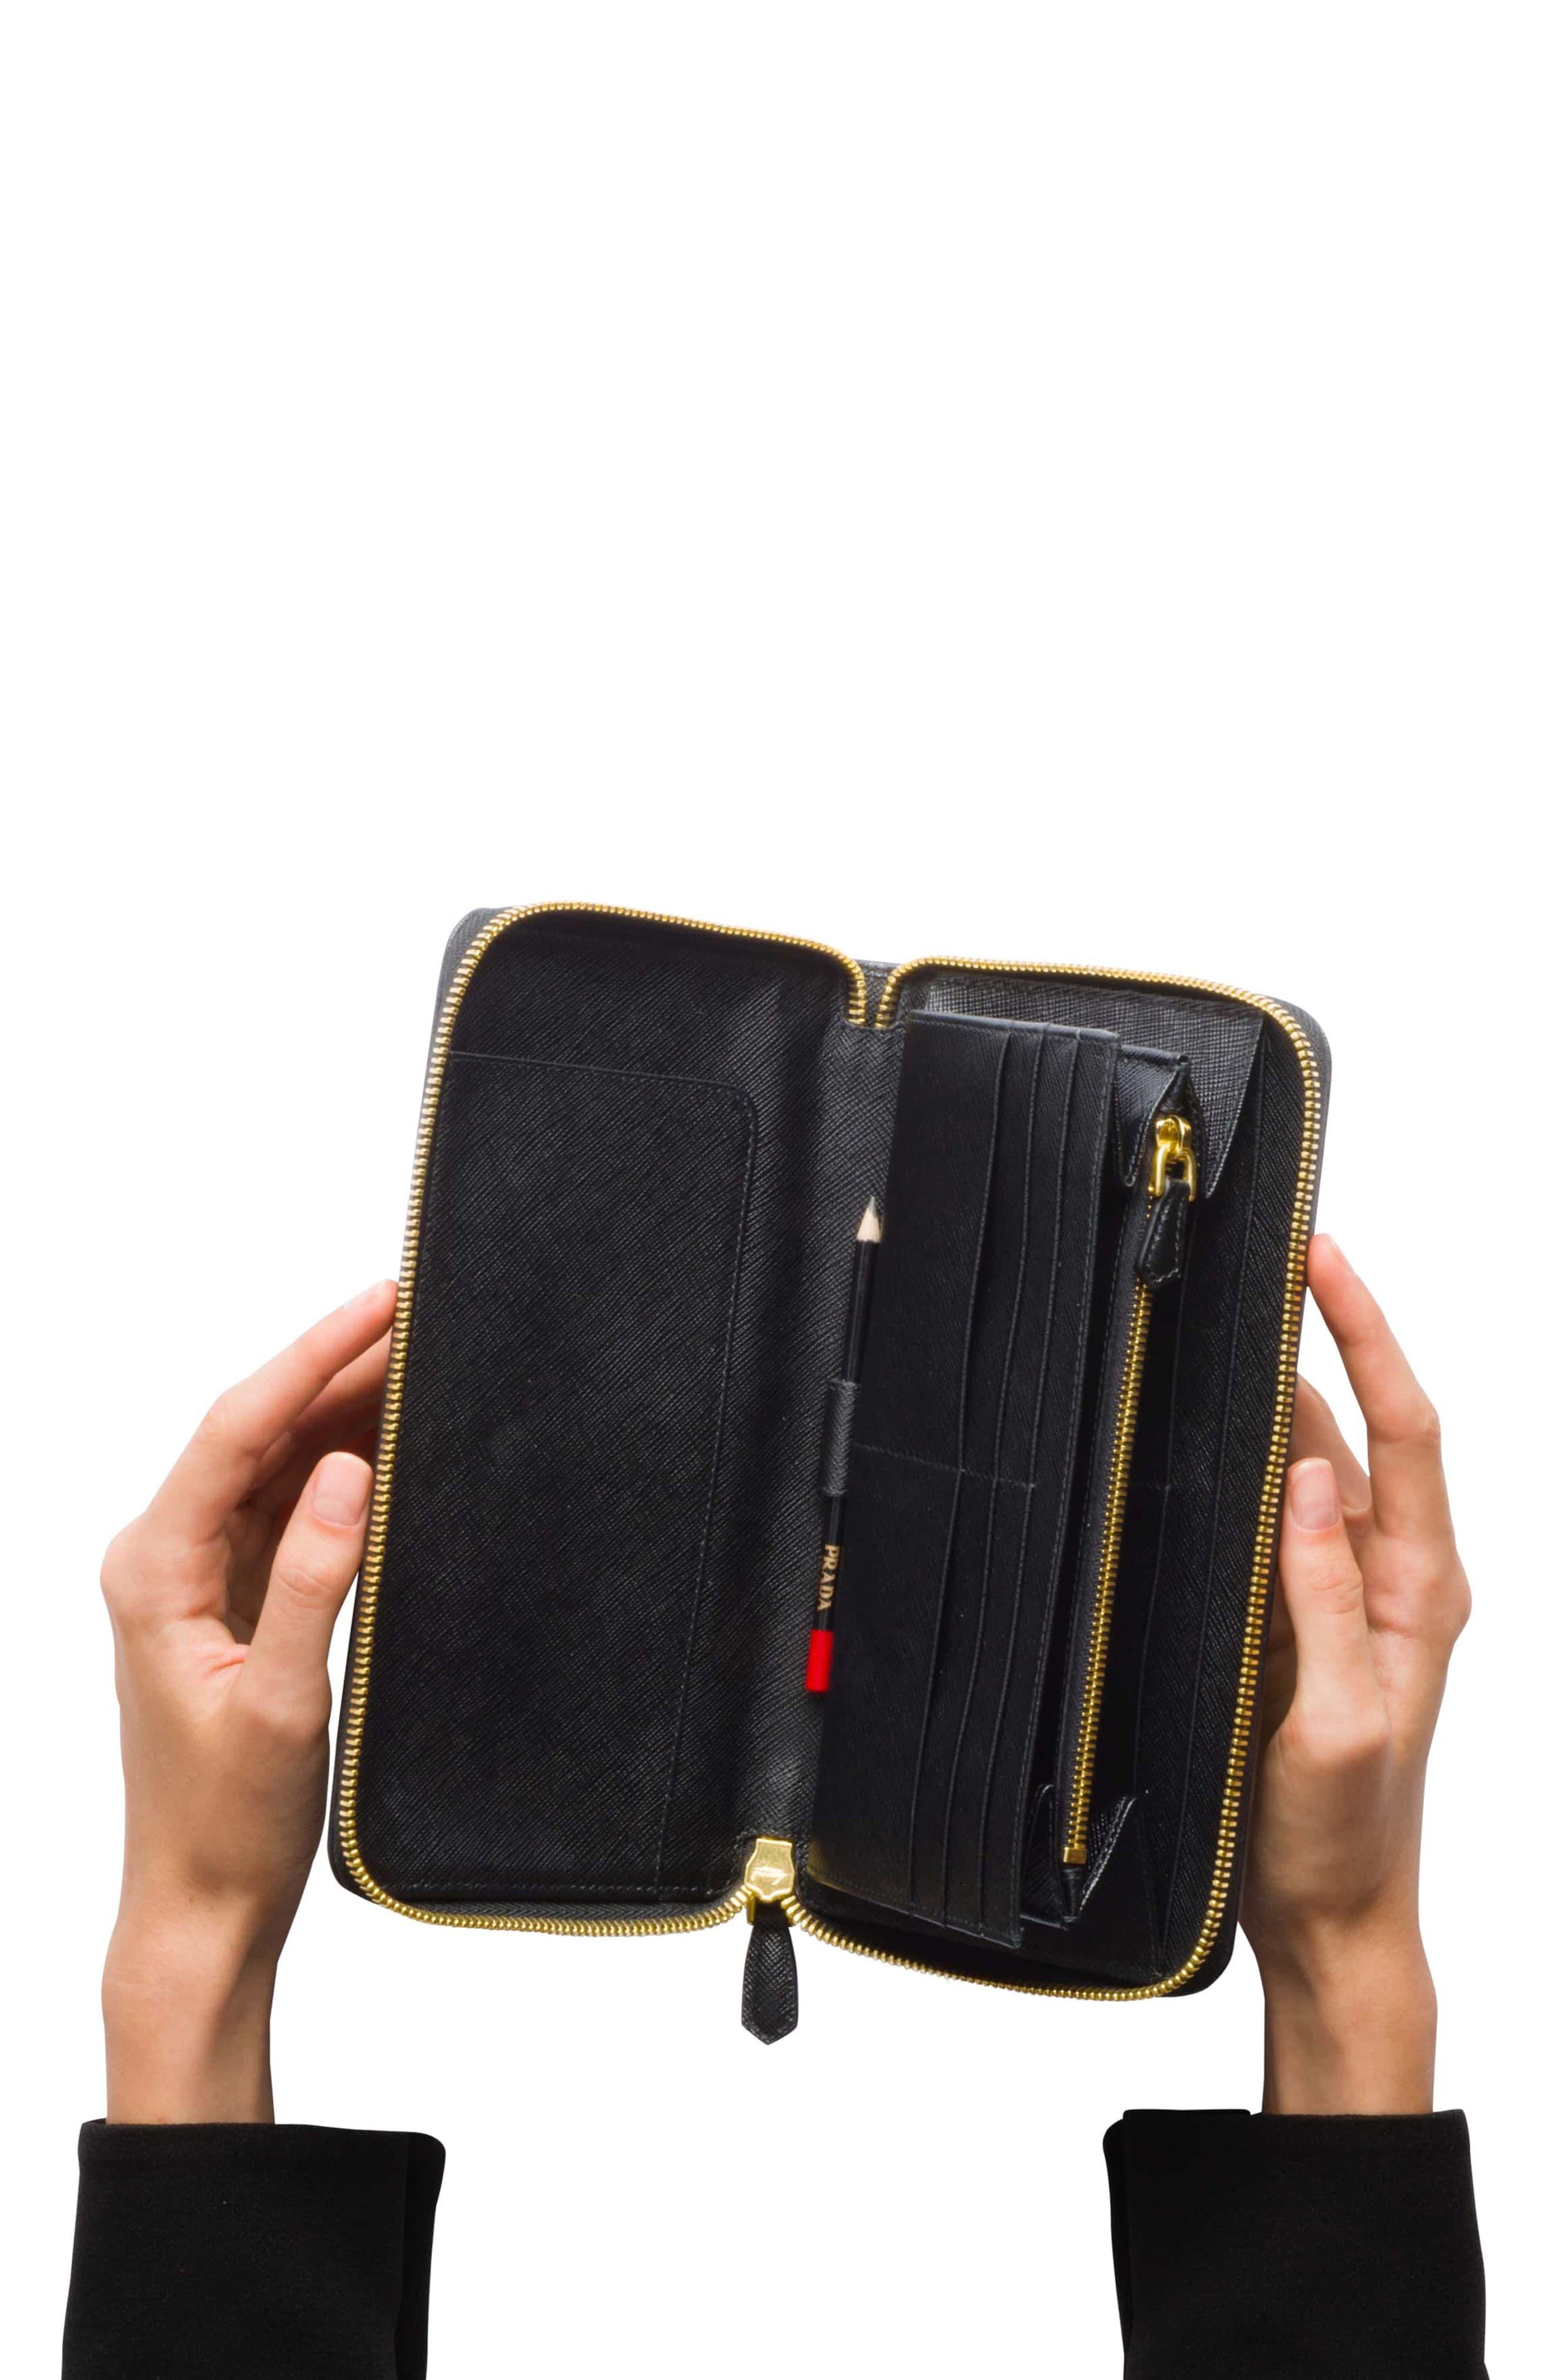 Oro Saffiano Leather Zip Around Wallet,                             Alternate thumbnail 6, color,                             001